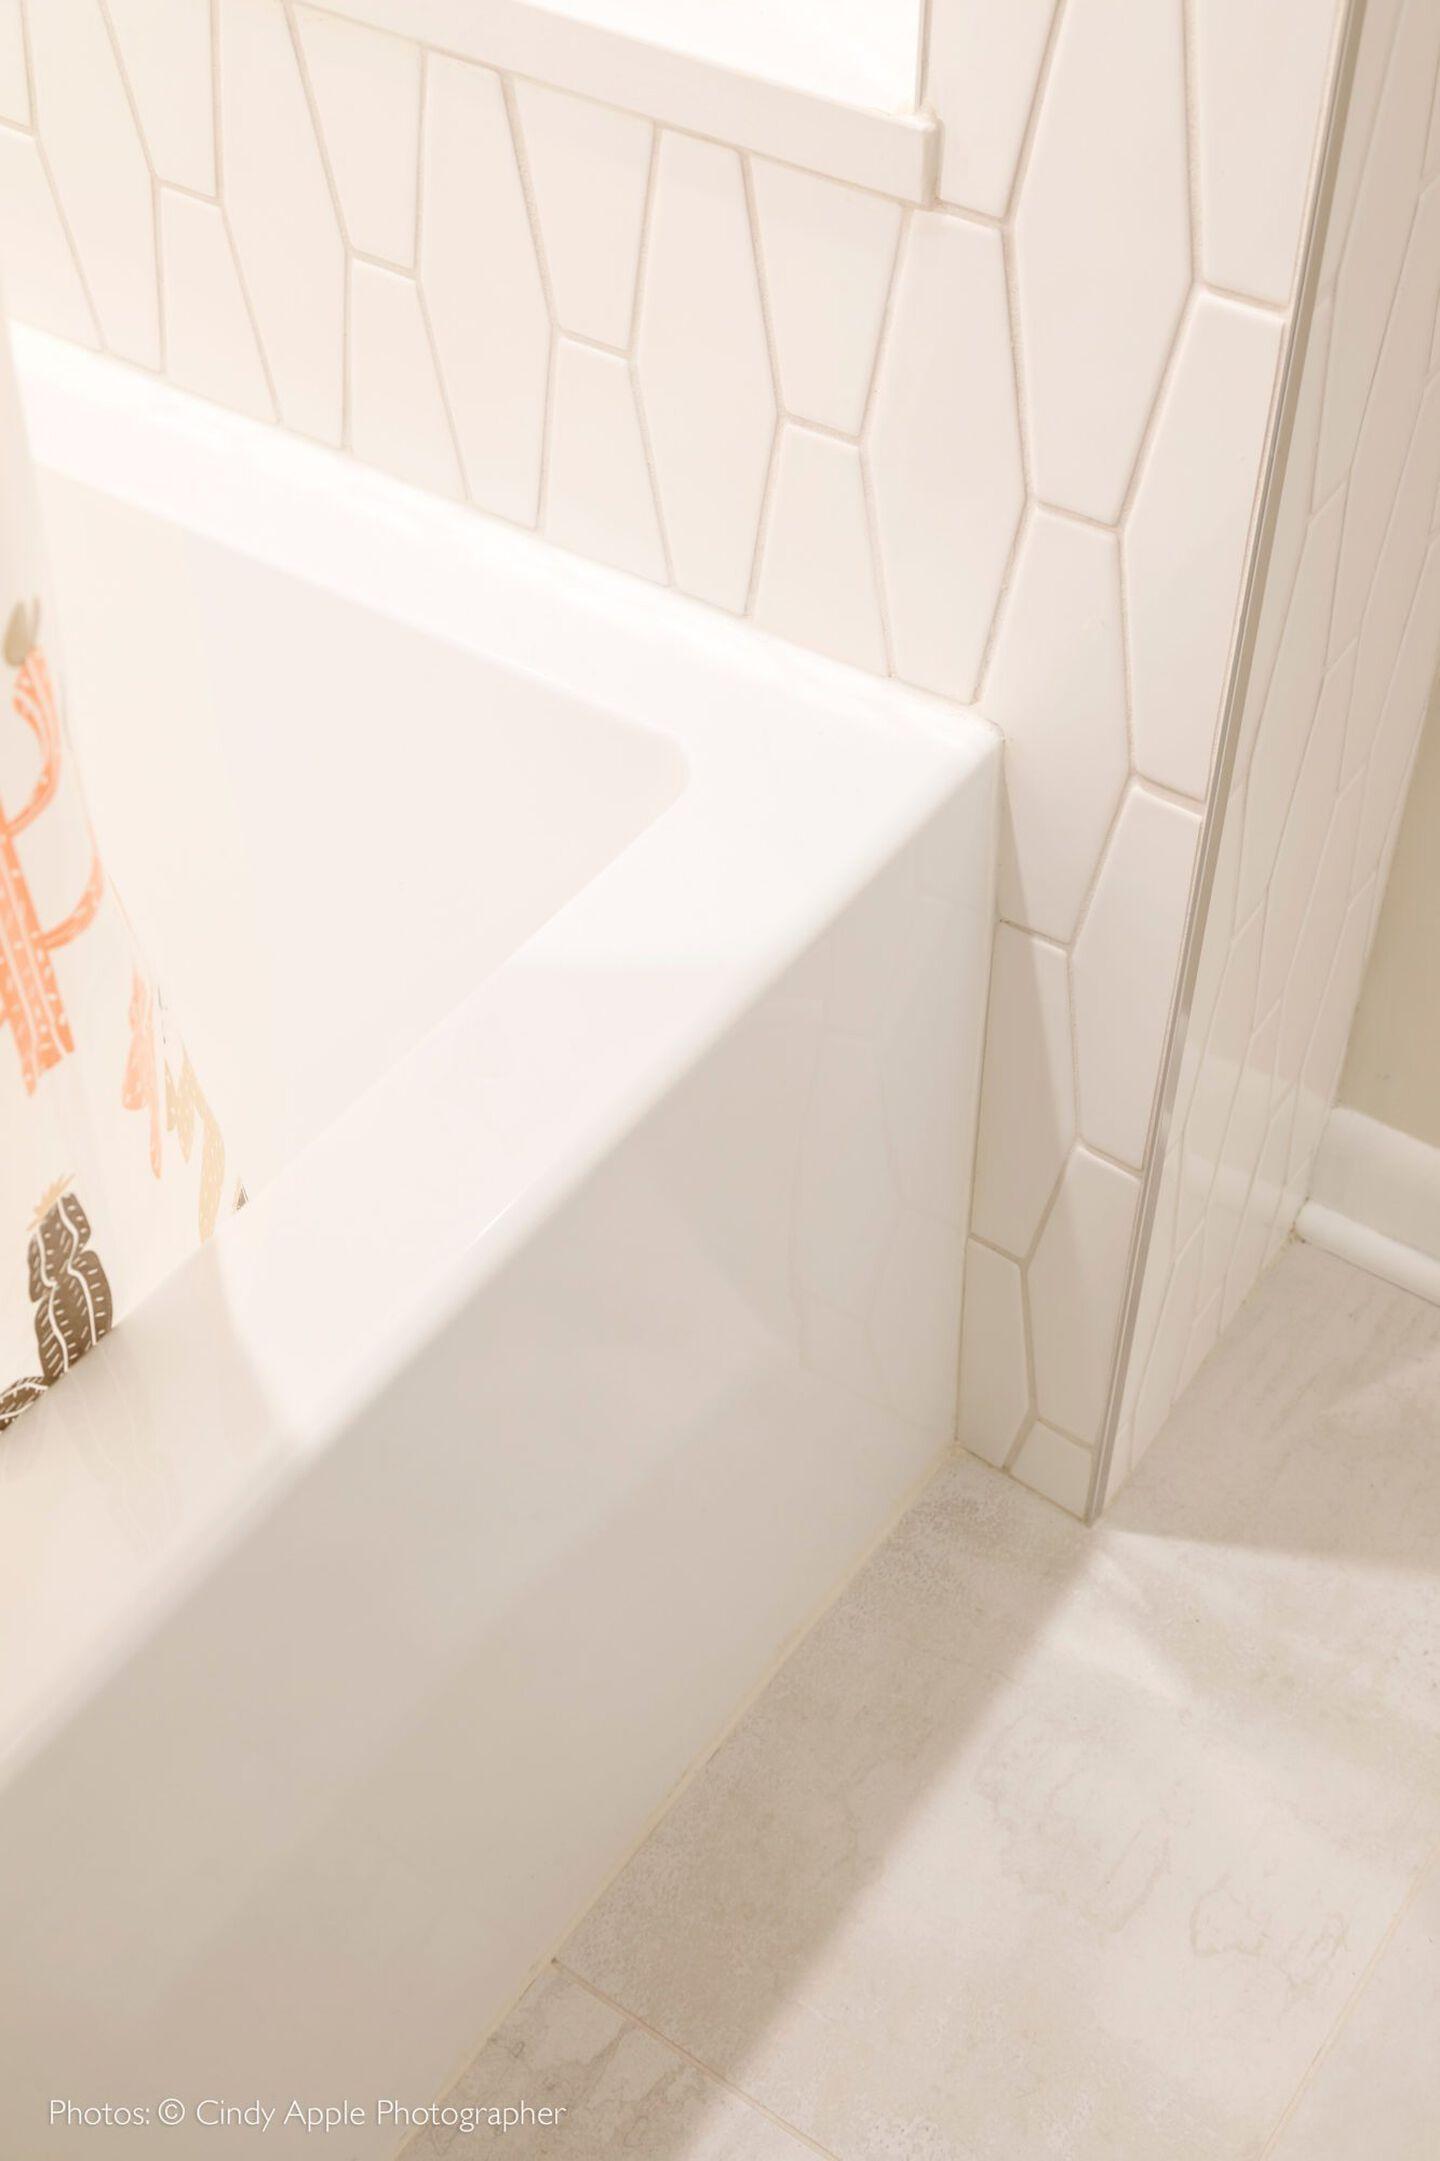 Linea skirted bath